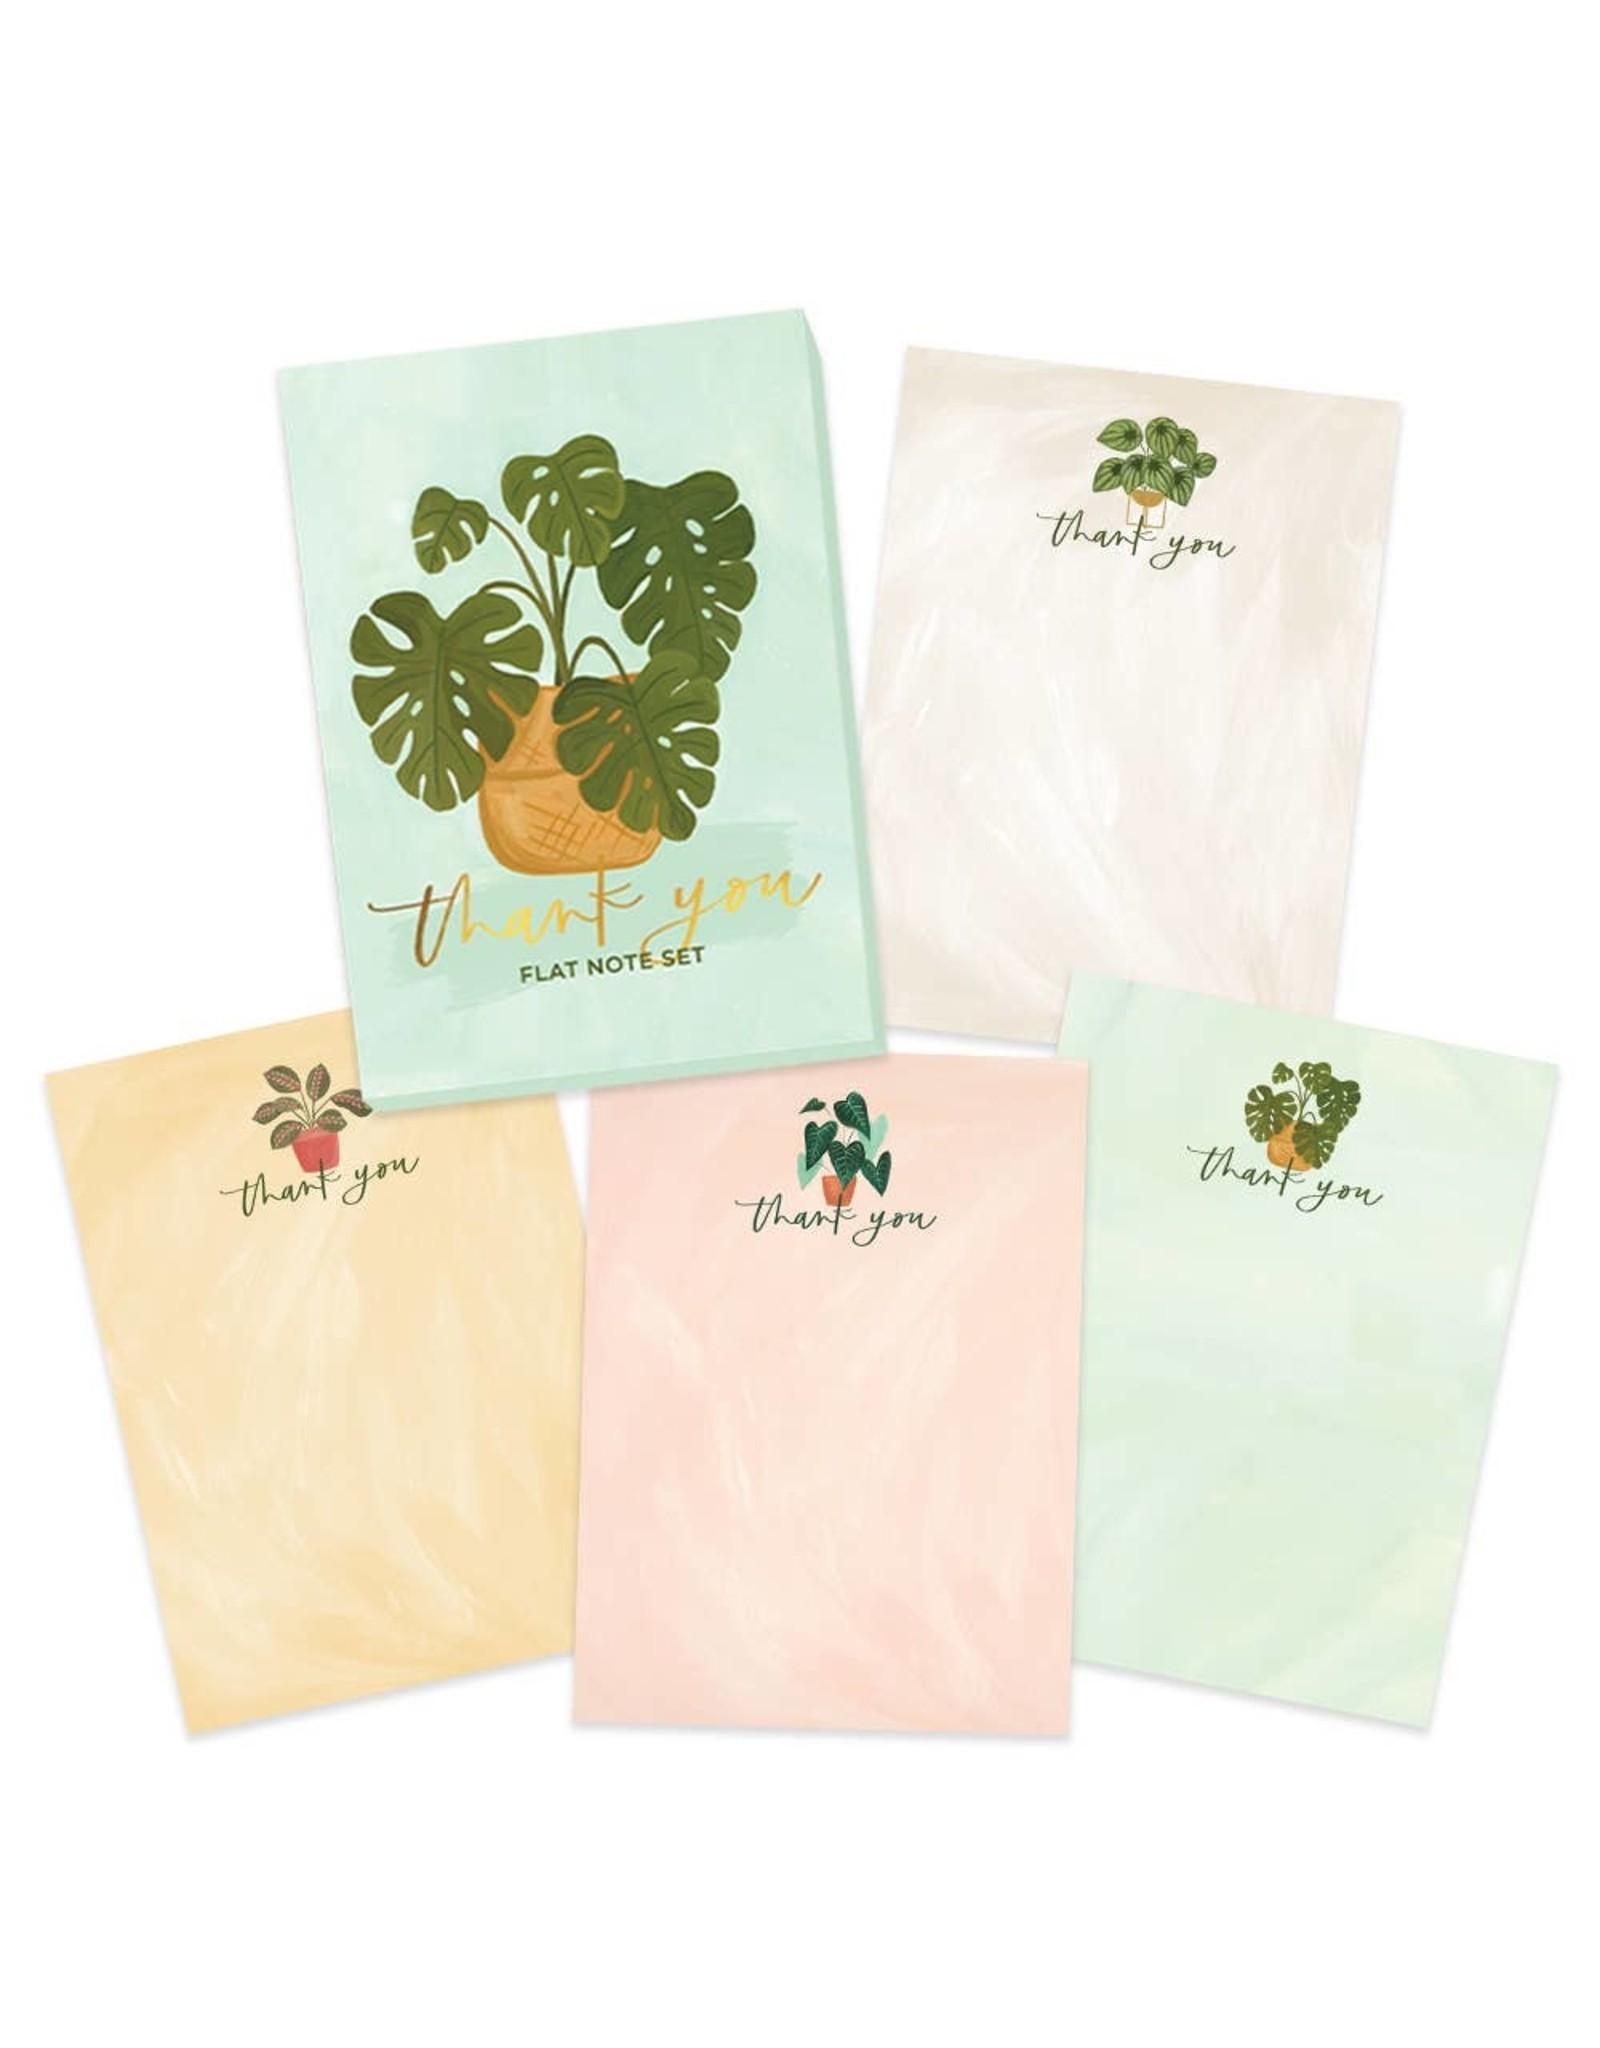 Thank You Flat Note Set: Plants